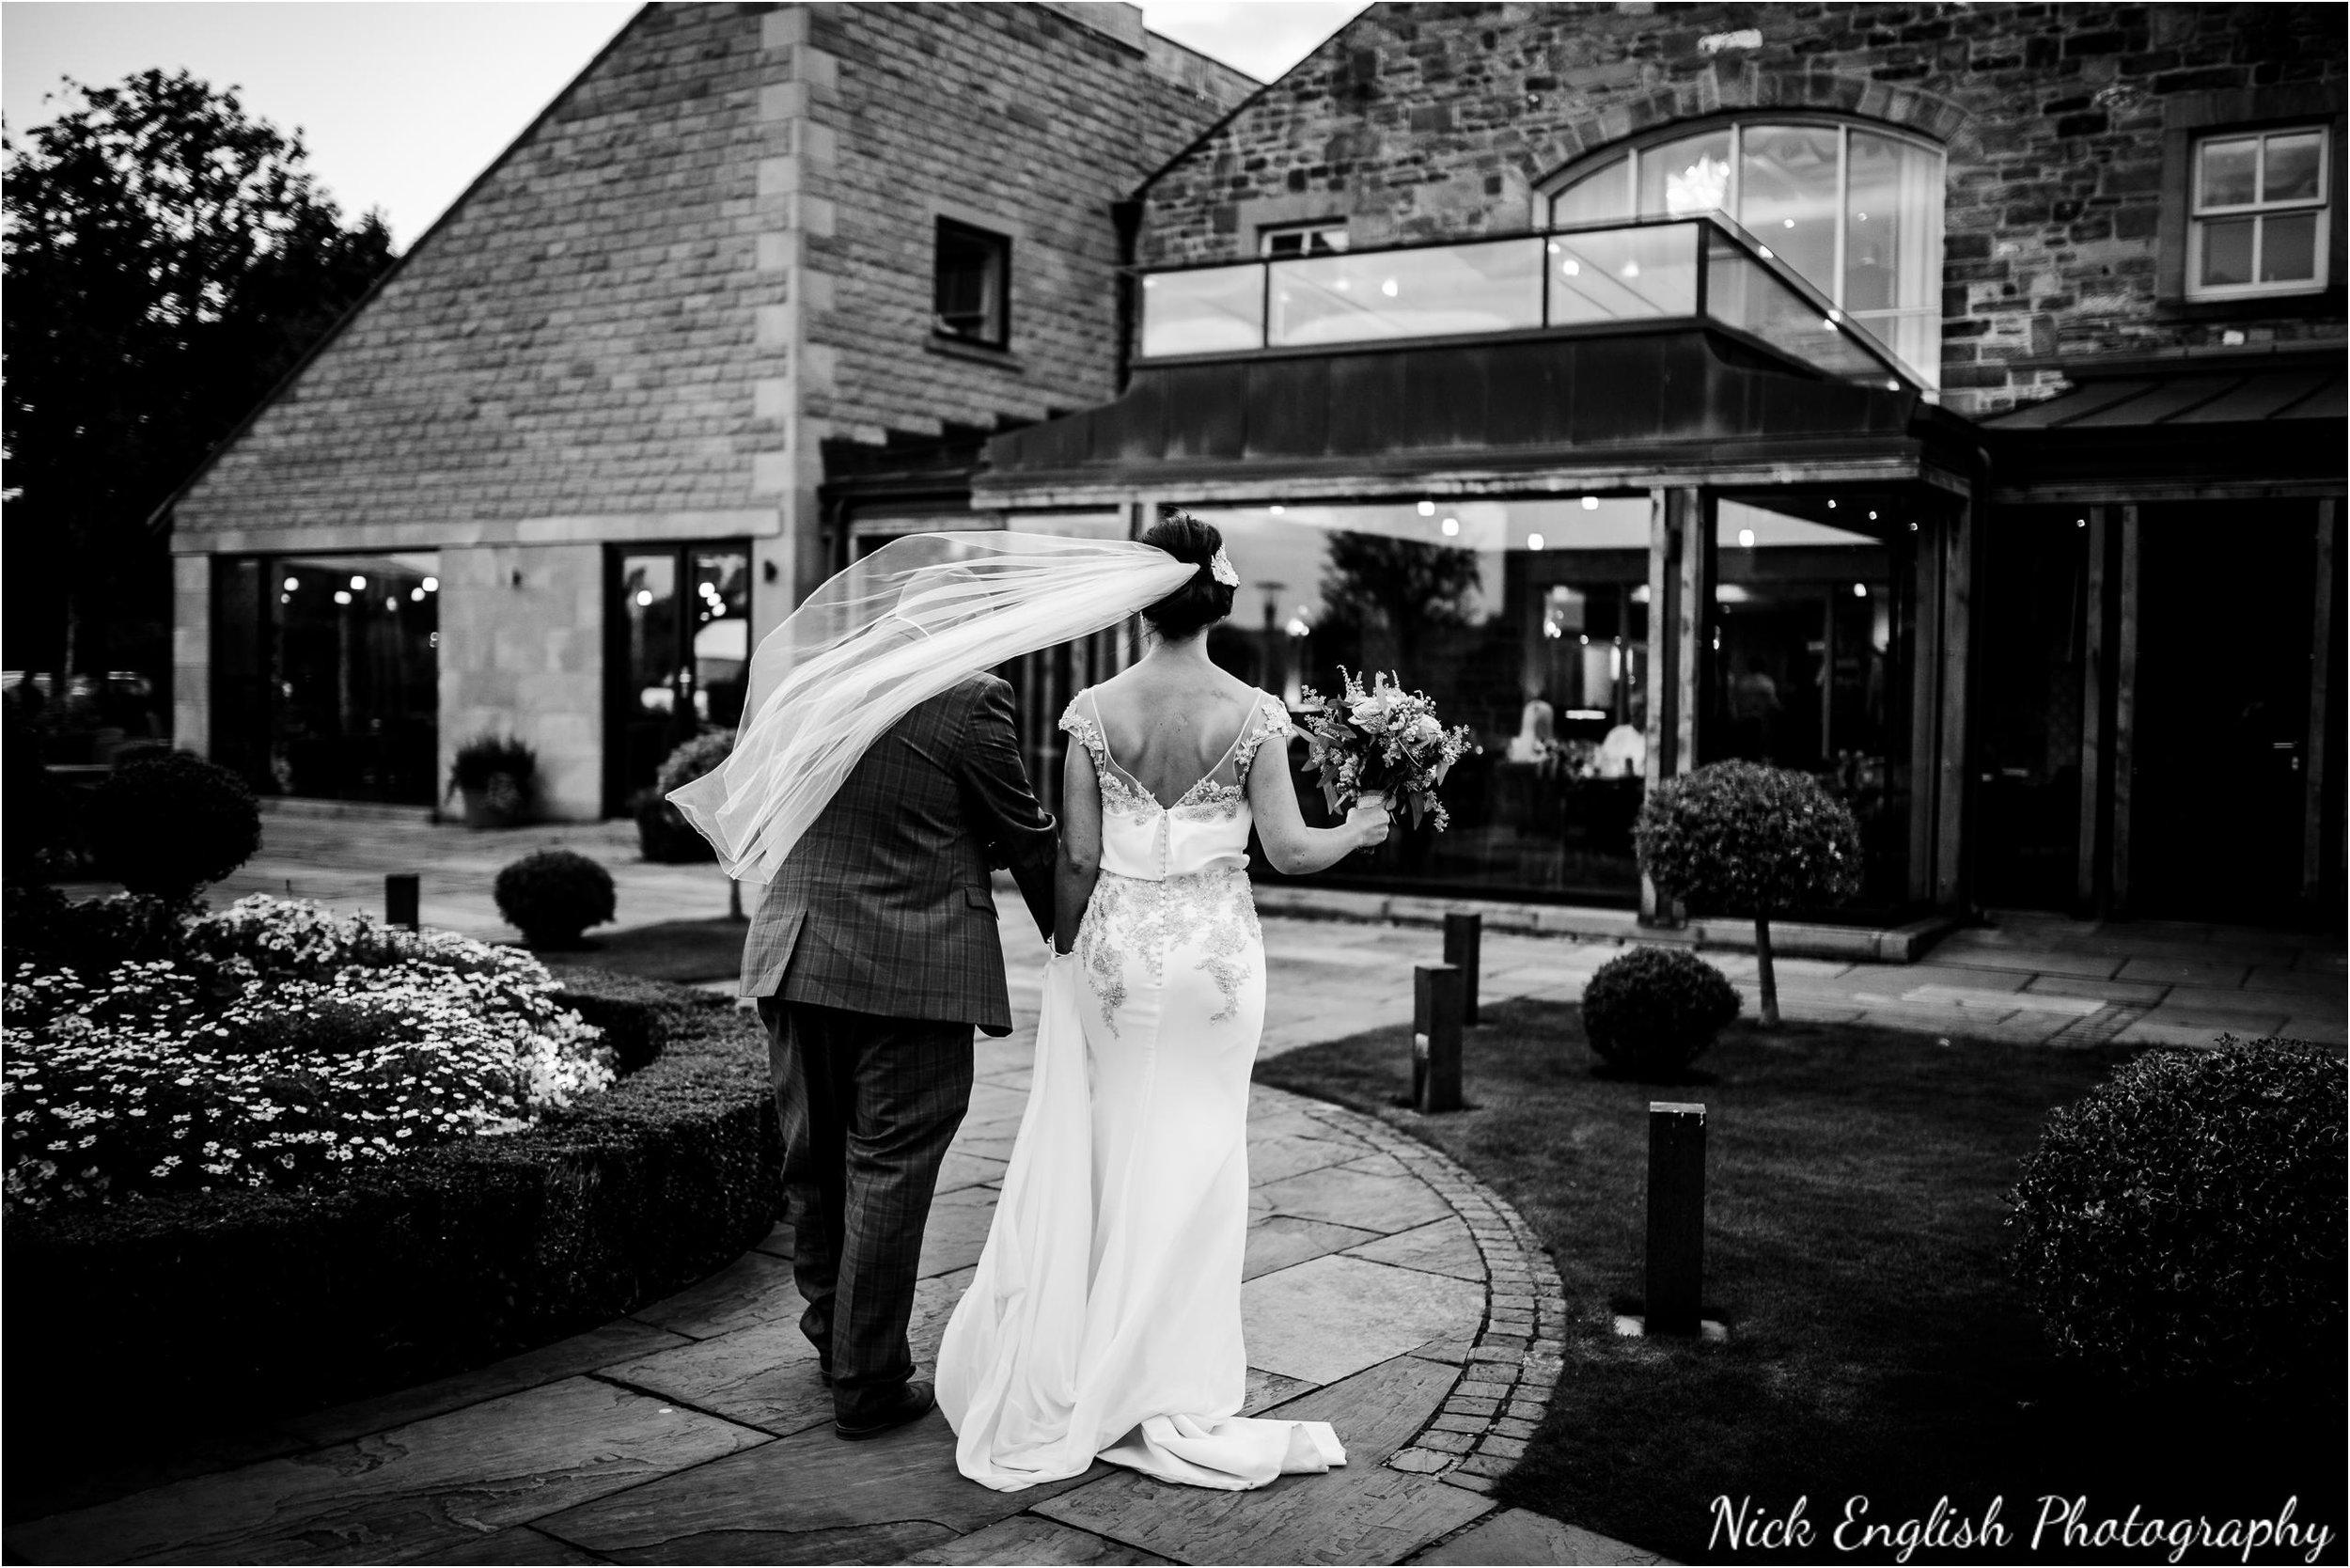 Stacey-Ash-Wedding-Photographs-Stanley-House-Preston-Lancashire-228.jpg